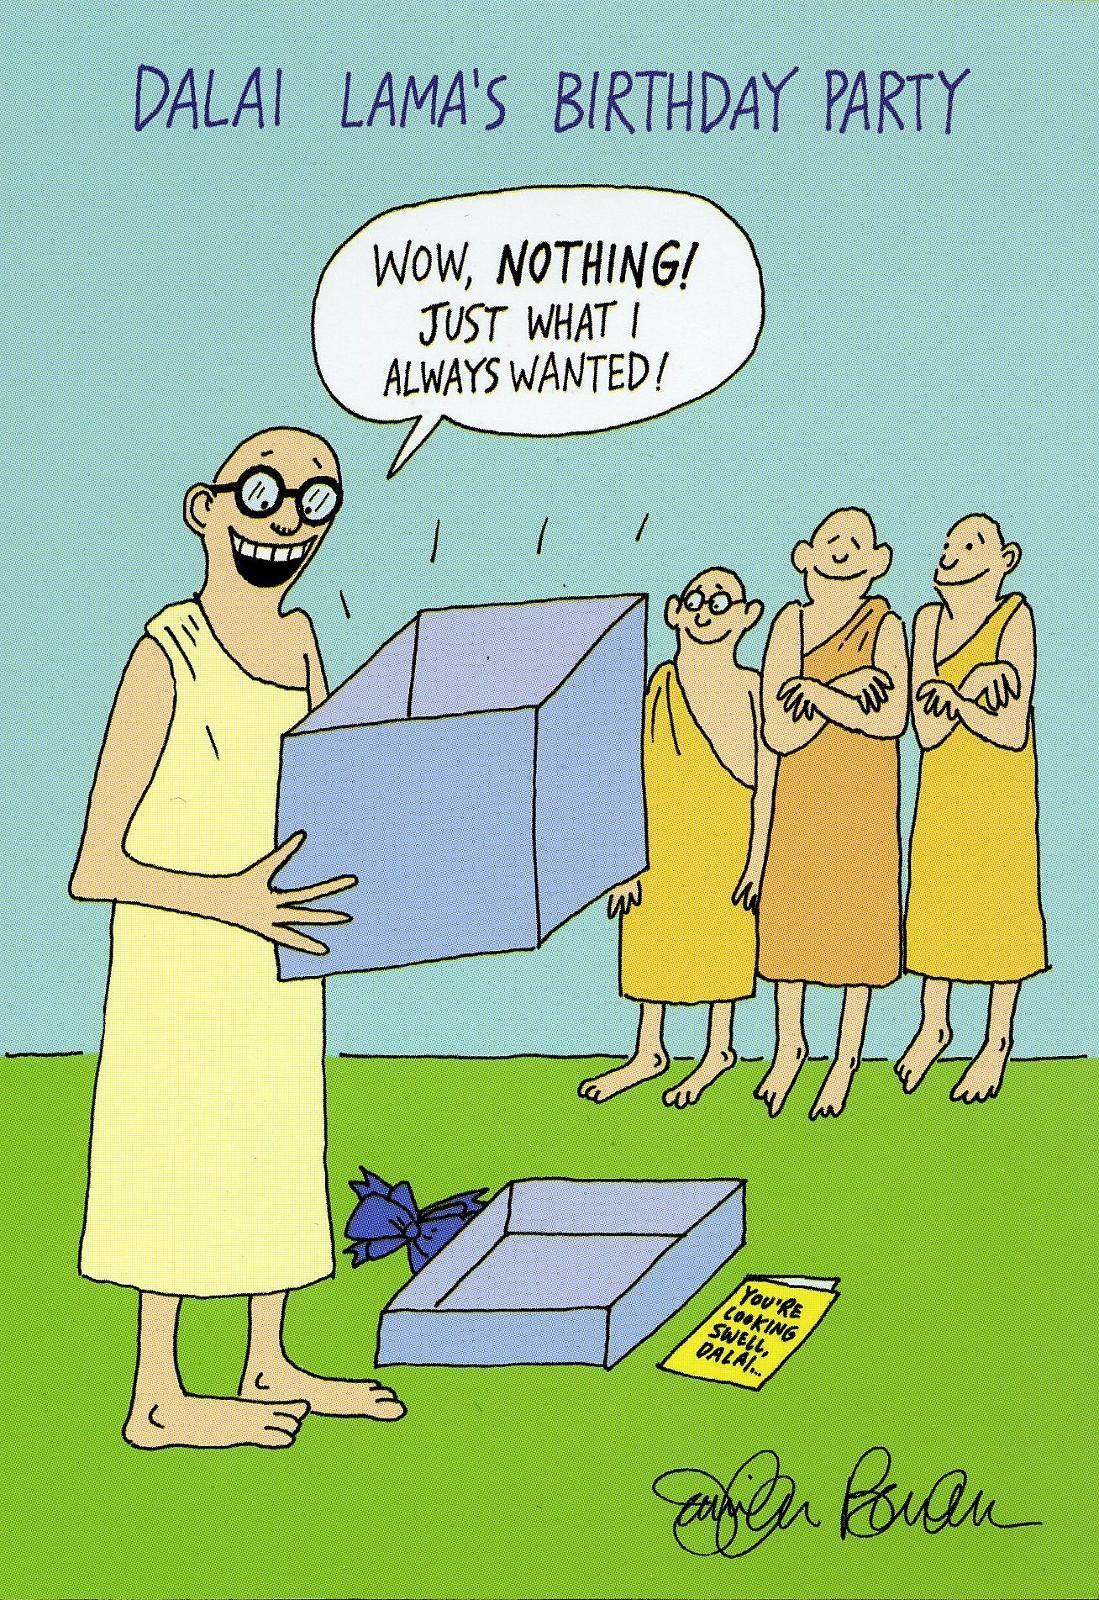 dalai lama birthday Dalai Lama's Birthday party | Funny | Humor, Funny, Religious humor dalai lama birthday